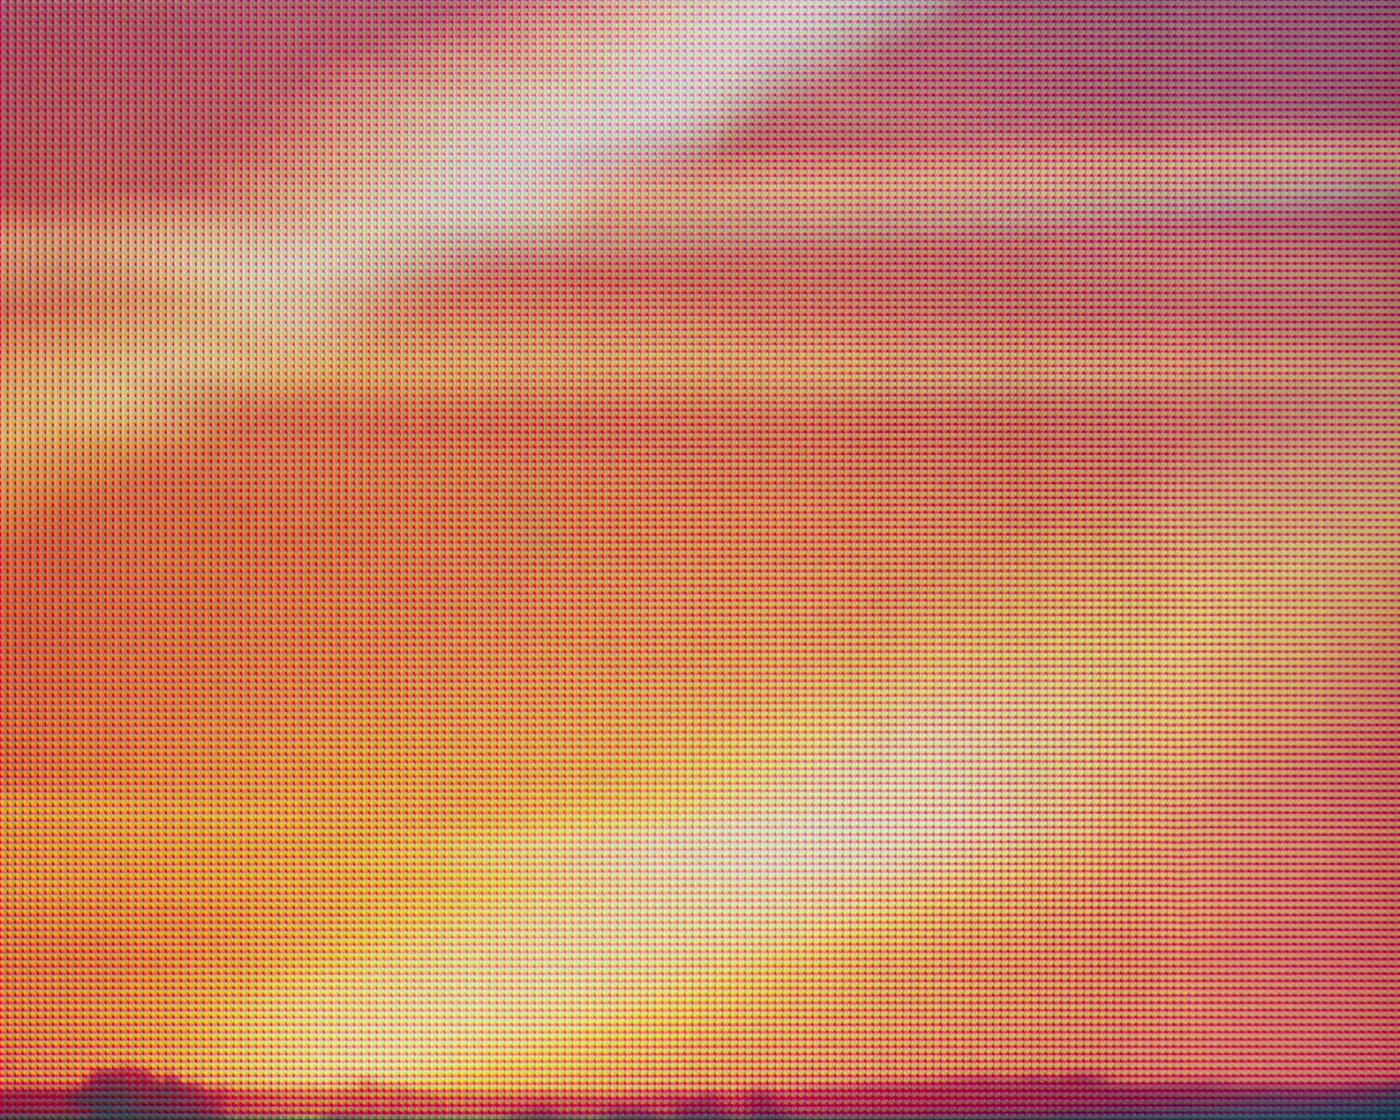 sg_sunset_11.jpg